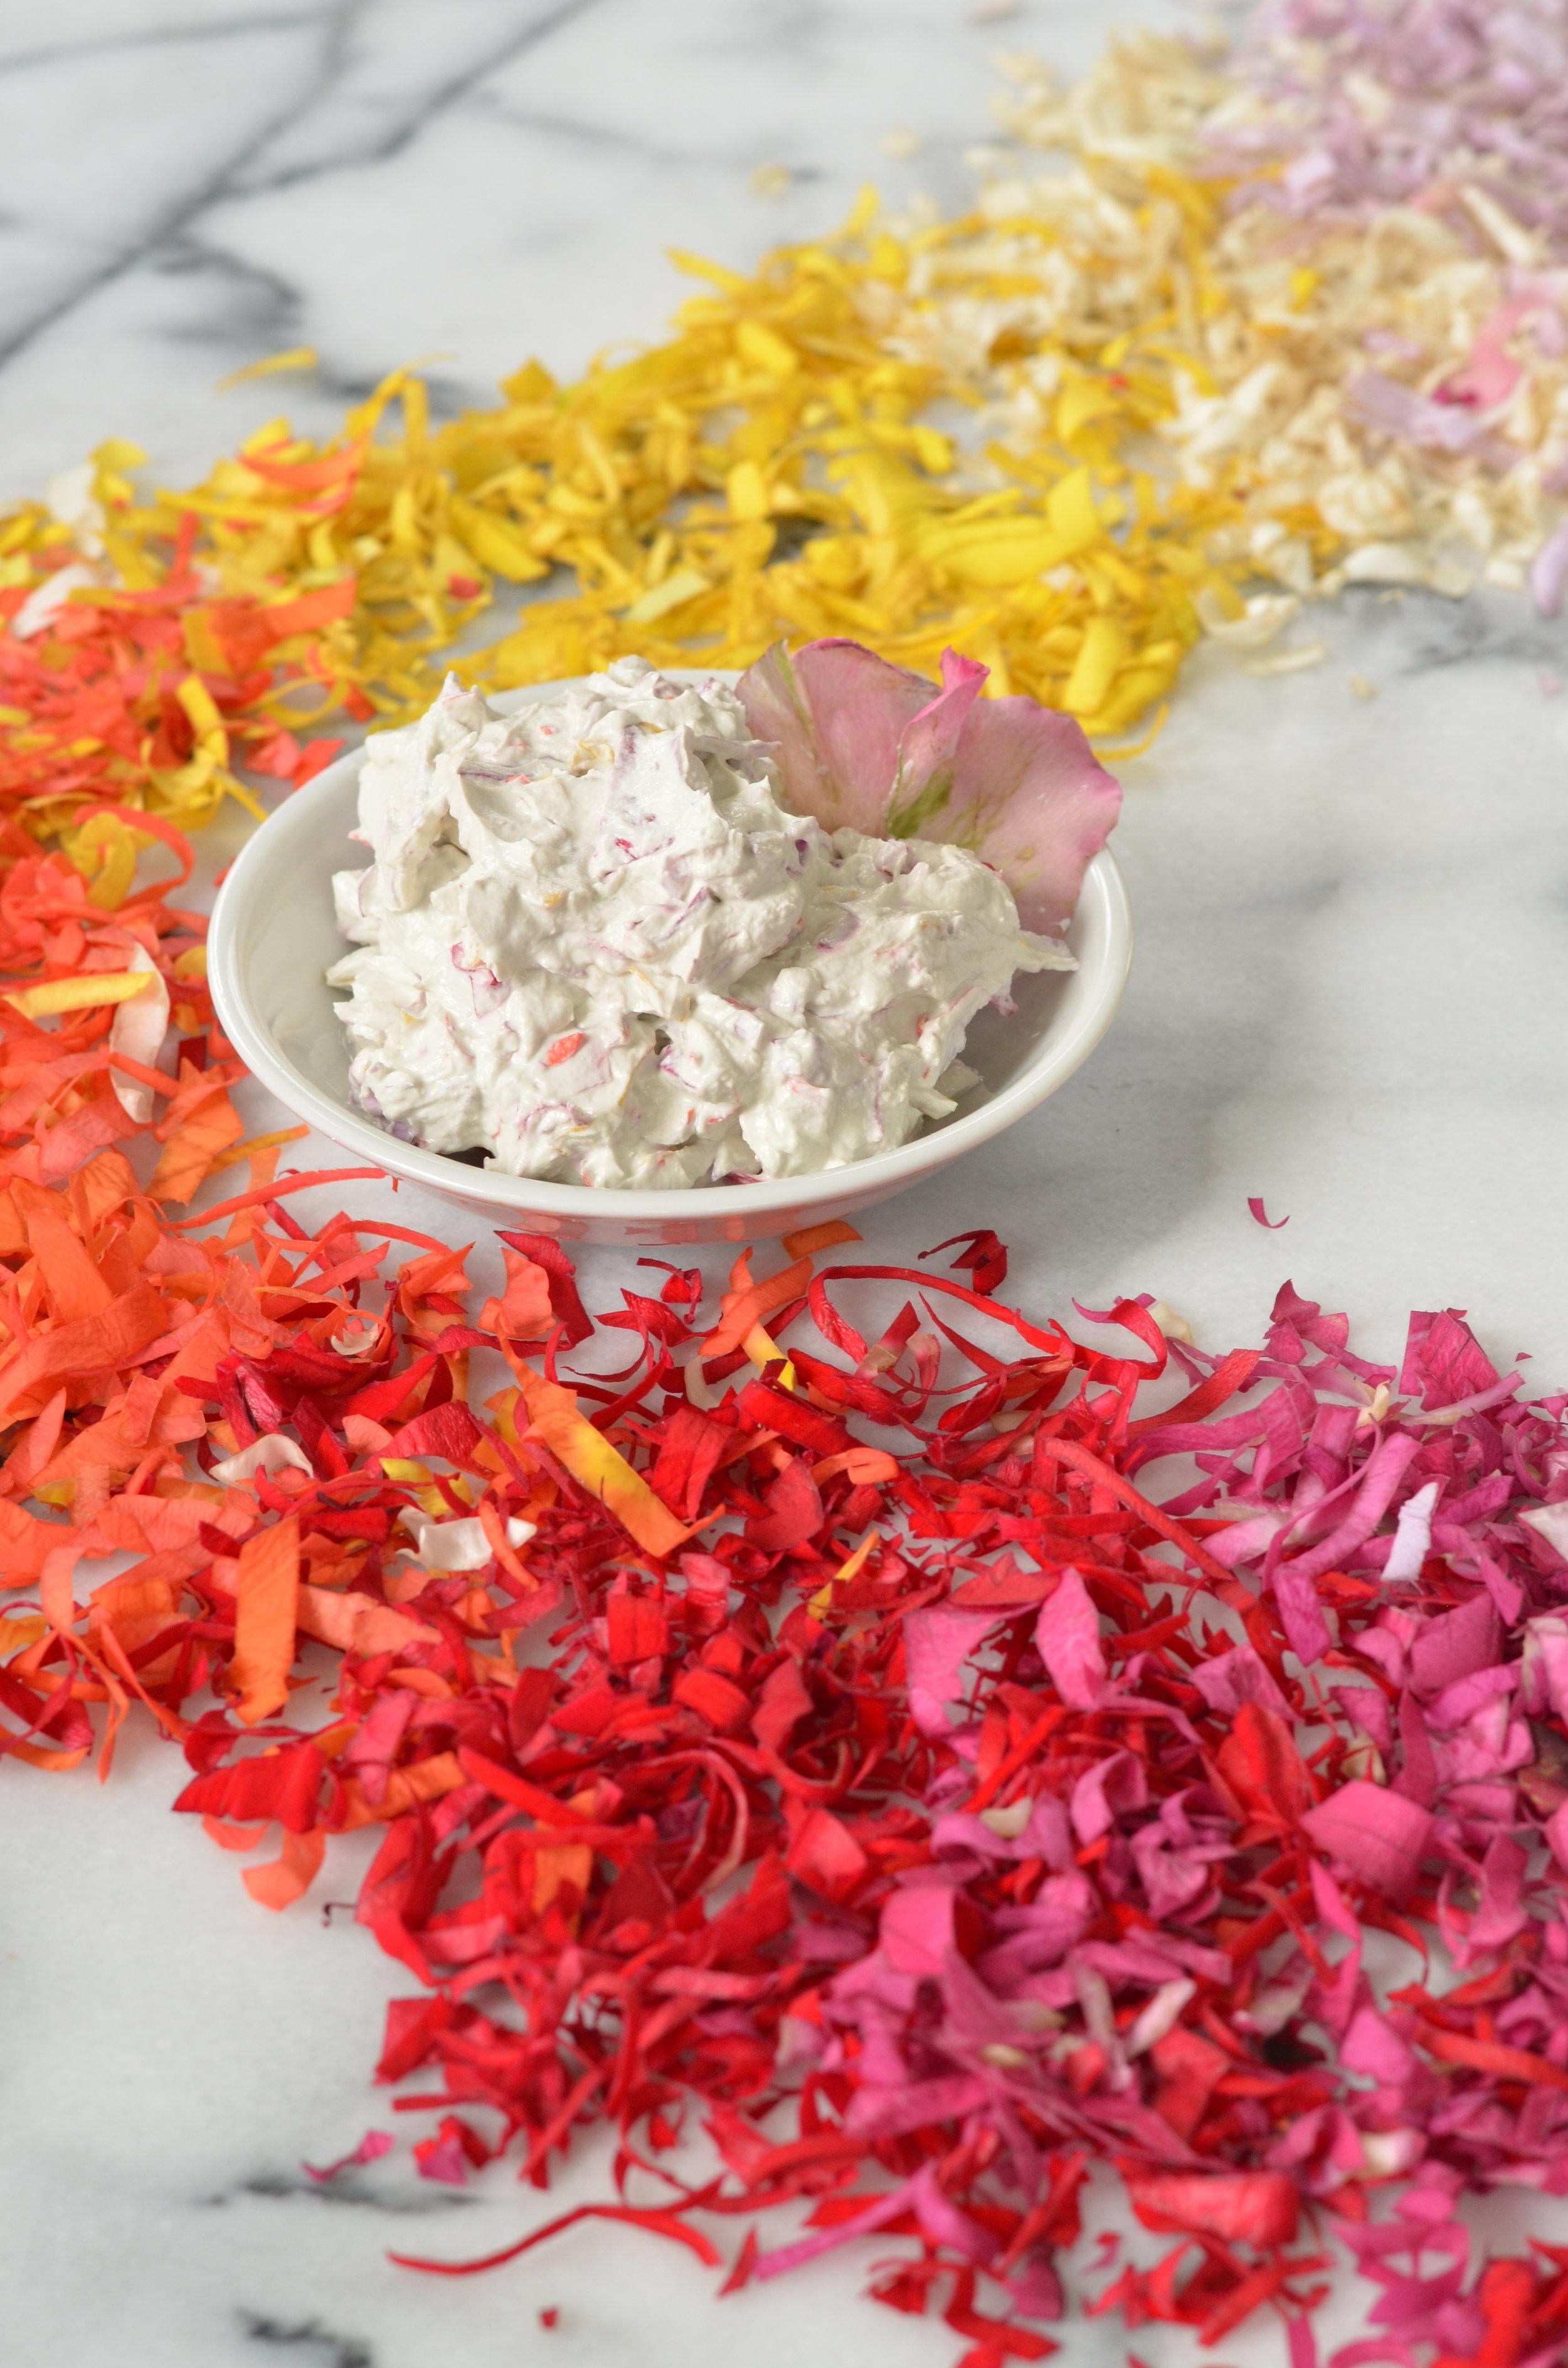 Flower Petal Confetti Mask 0.JPG